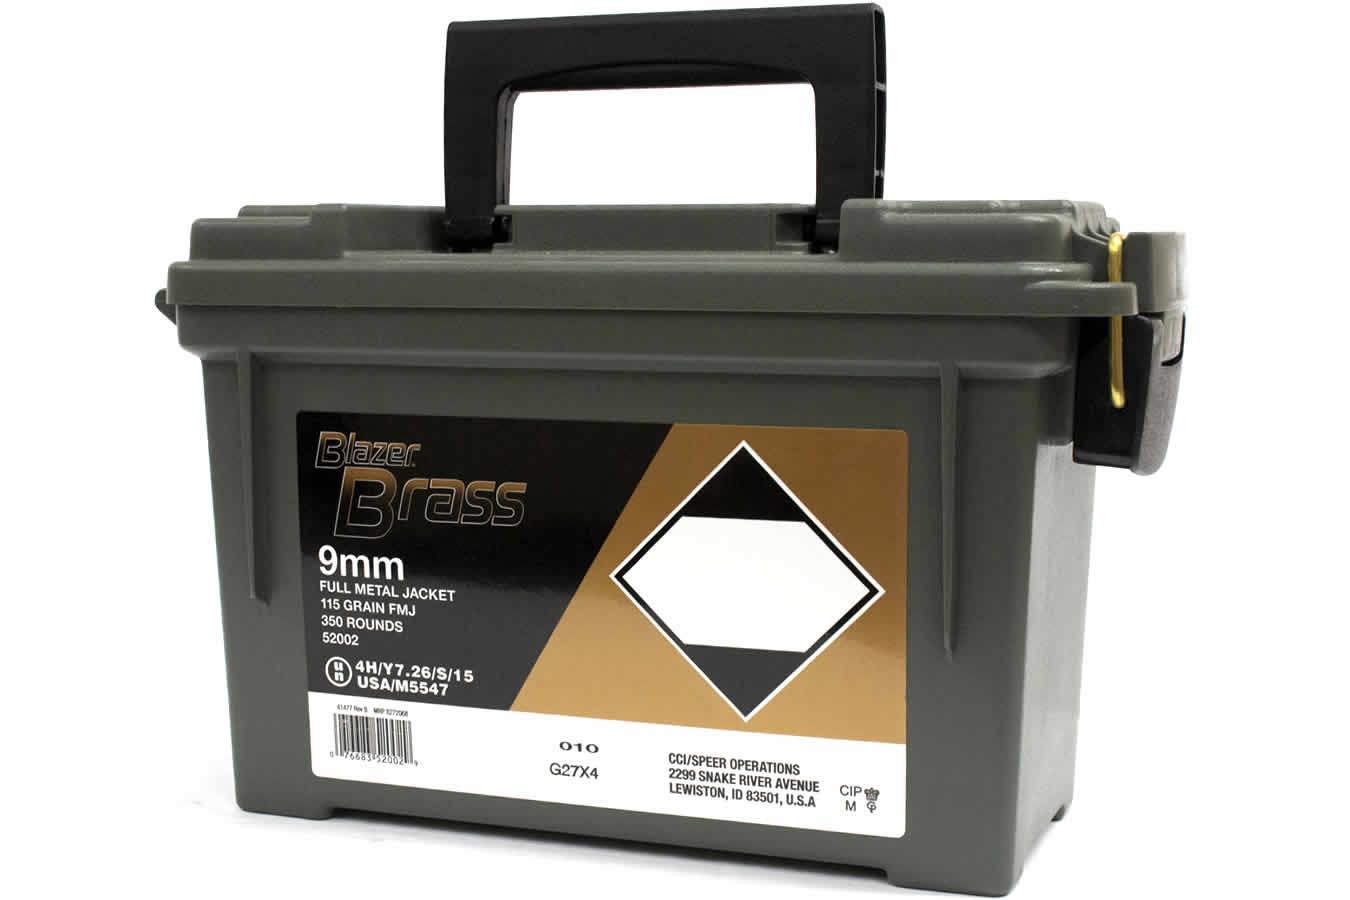 cci 9mm luger 115 gr fmj blazer brass 350 round ammo can